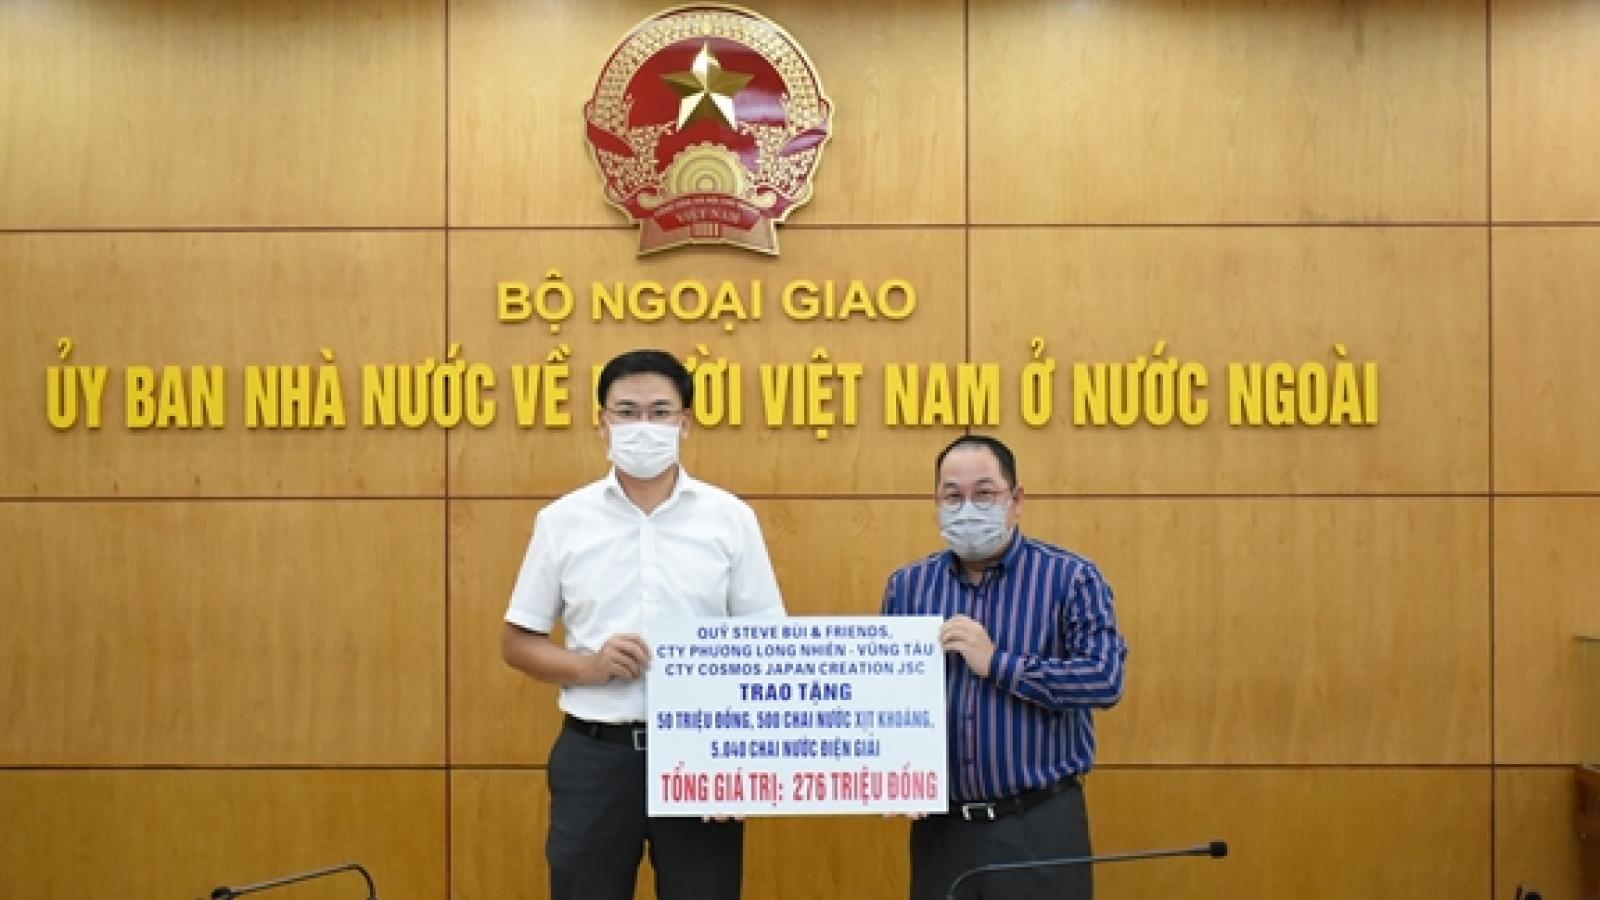 Overseas Vietnamese supports domestic COVID-19 fight